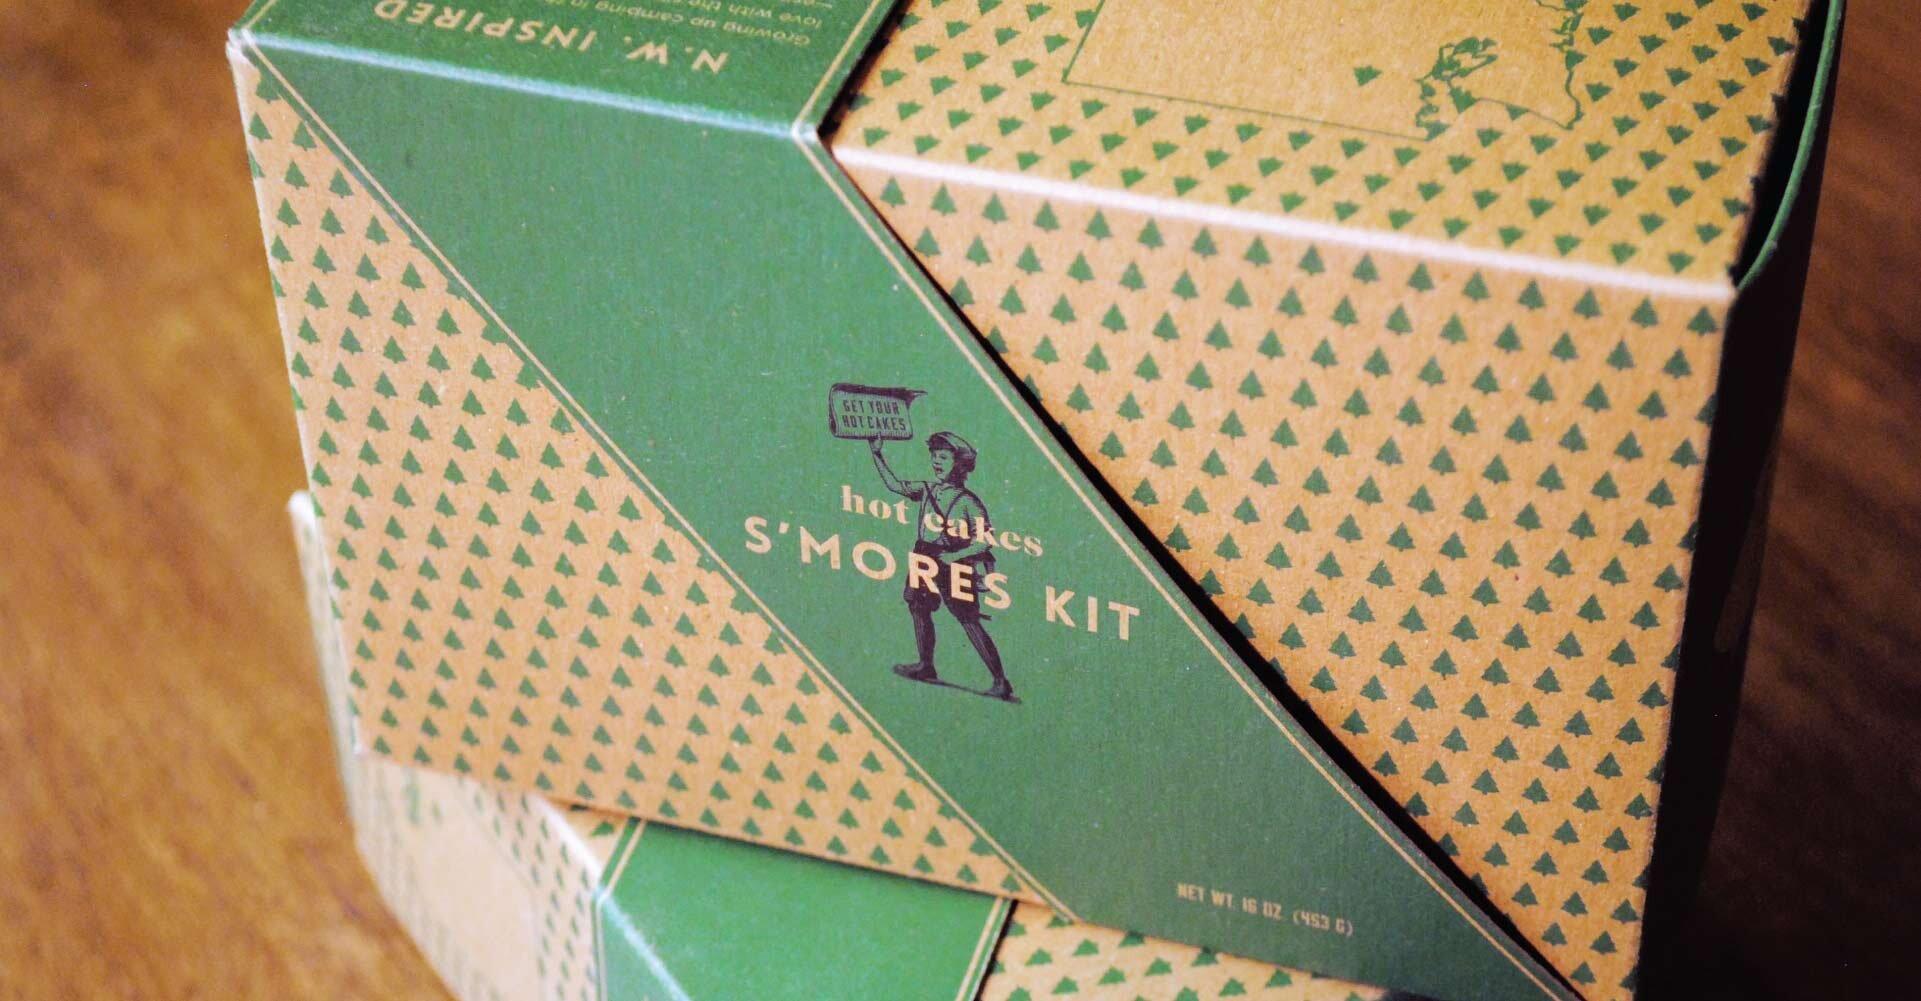 Creative_Retail_Packaging_Design_Hot-Cakes_5.jpg